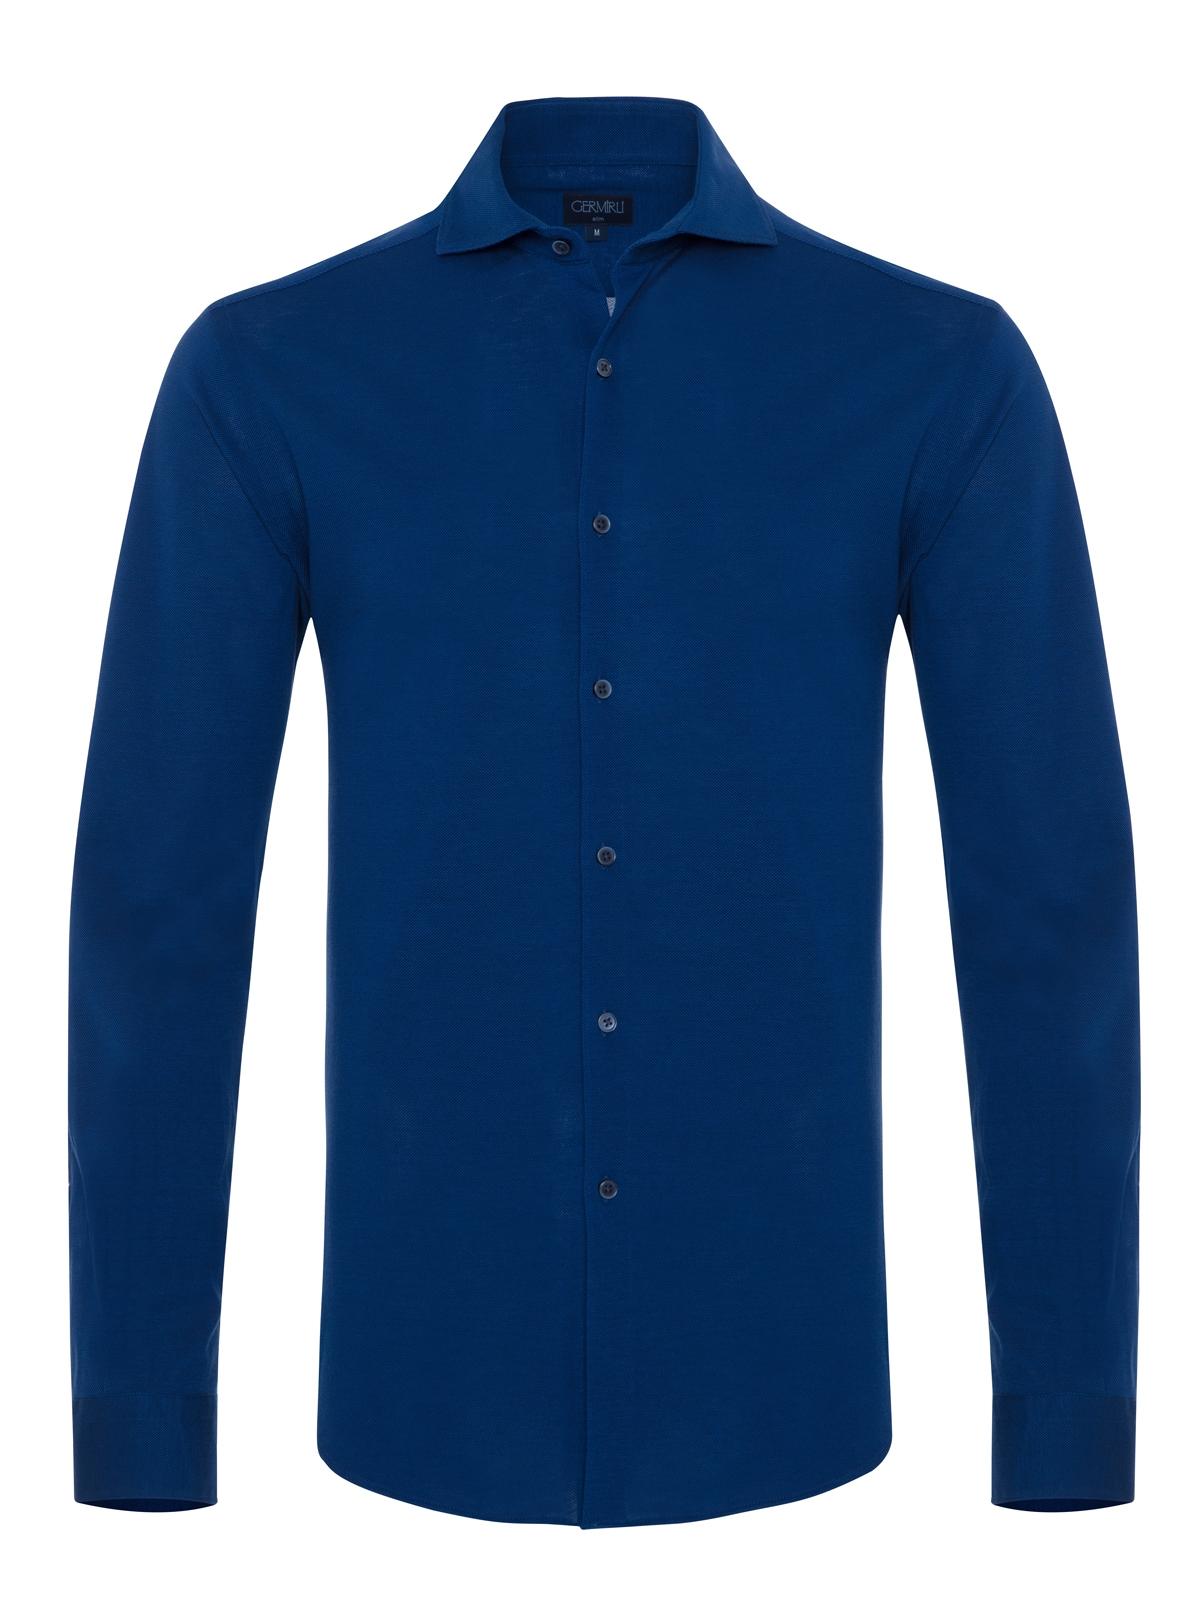 Germirli - Germirli Lacivert Italyan Yaka Örme Slim Fit Gömlek